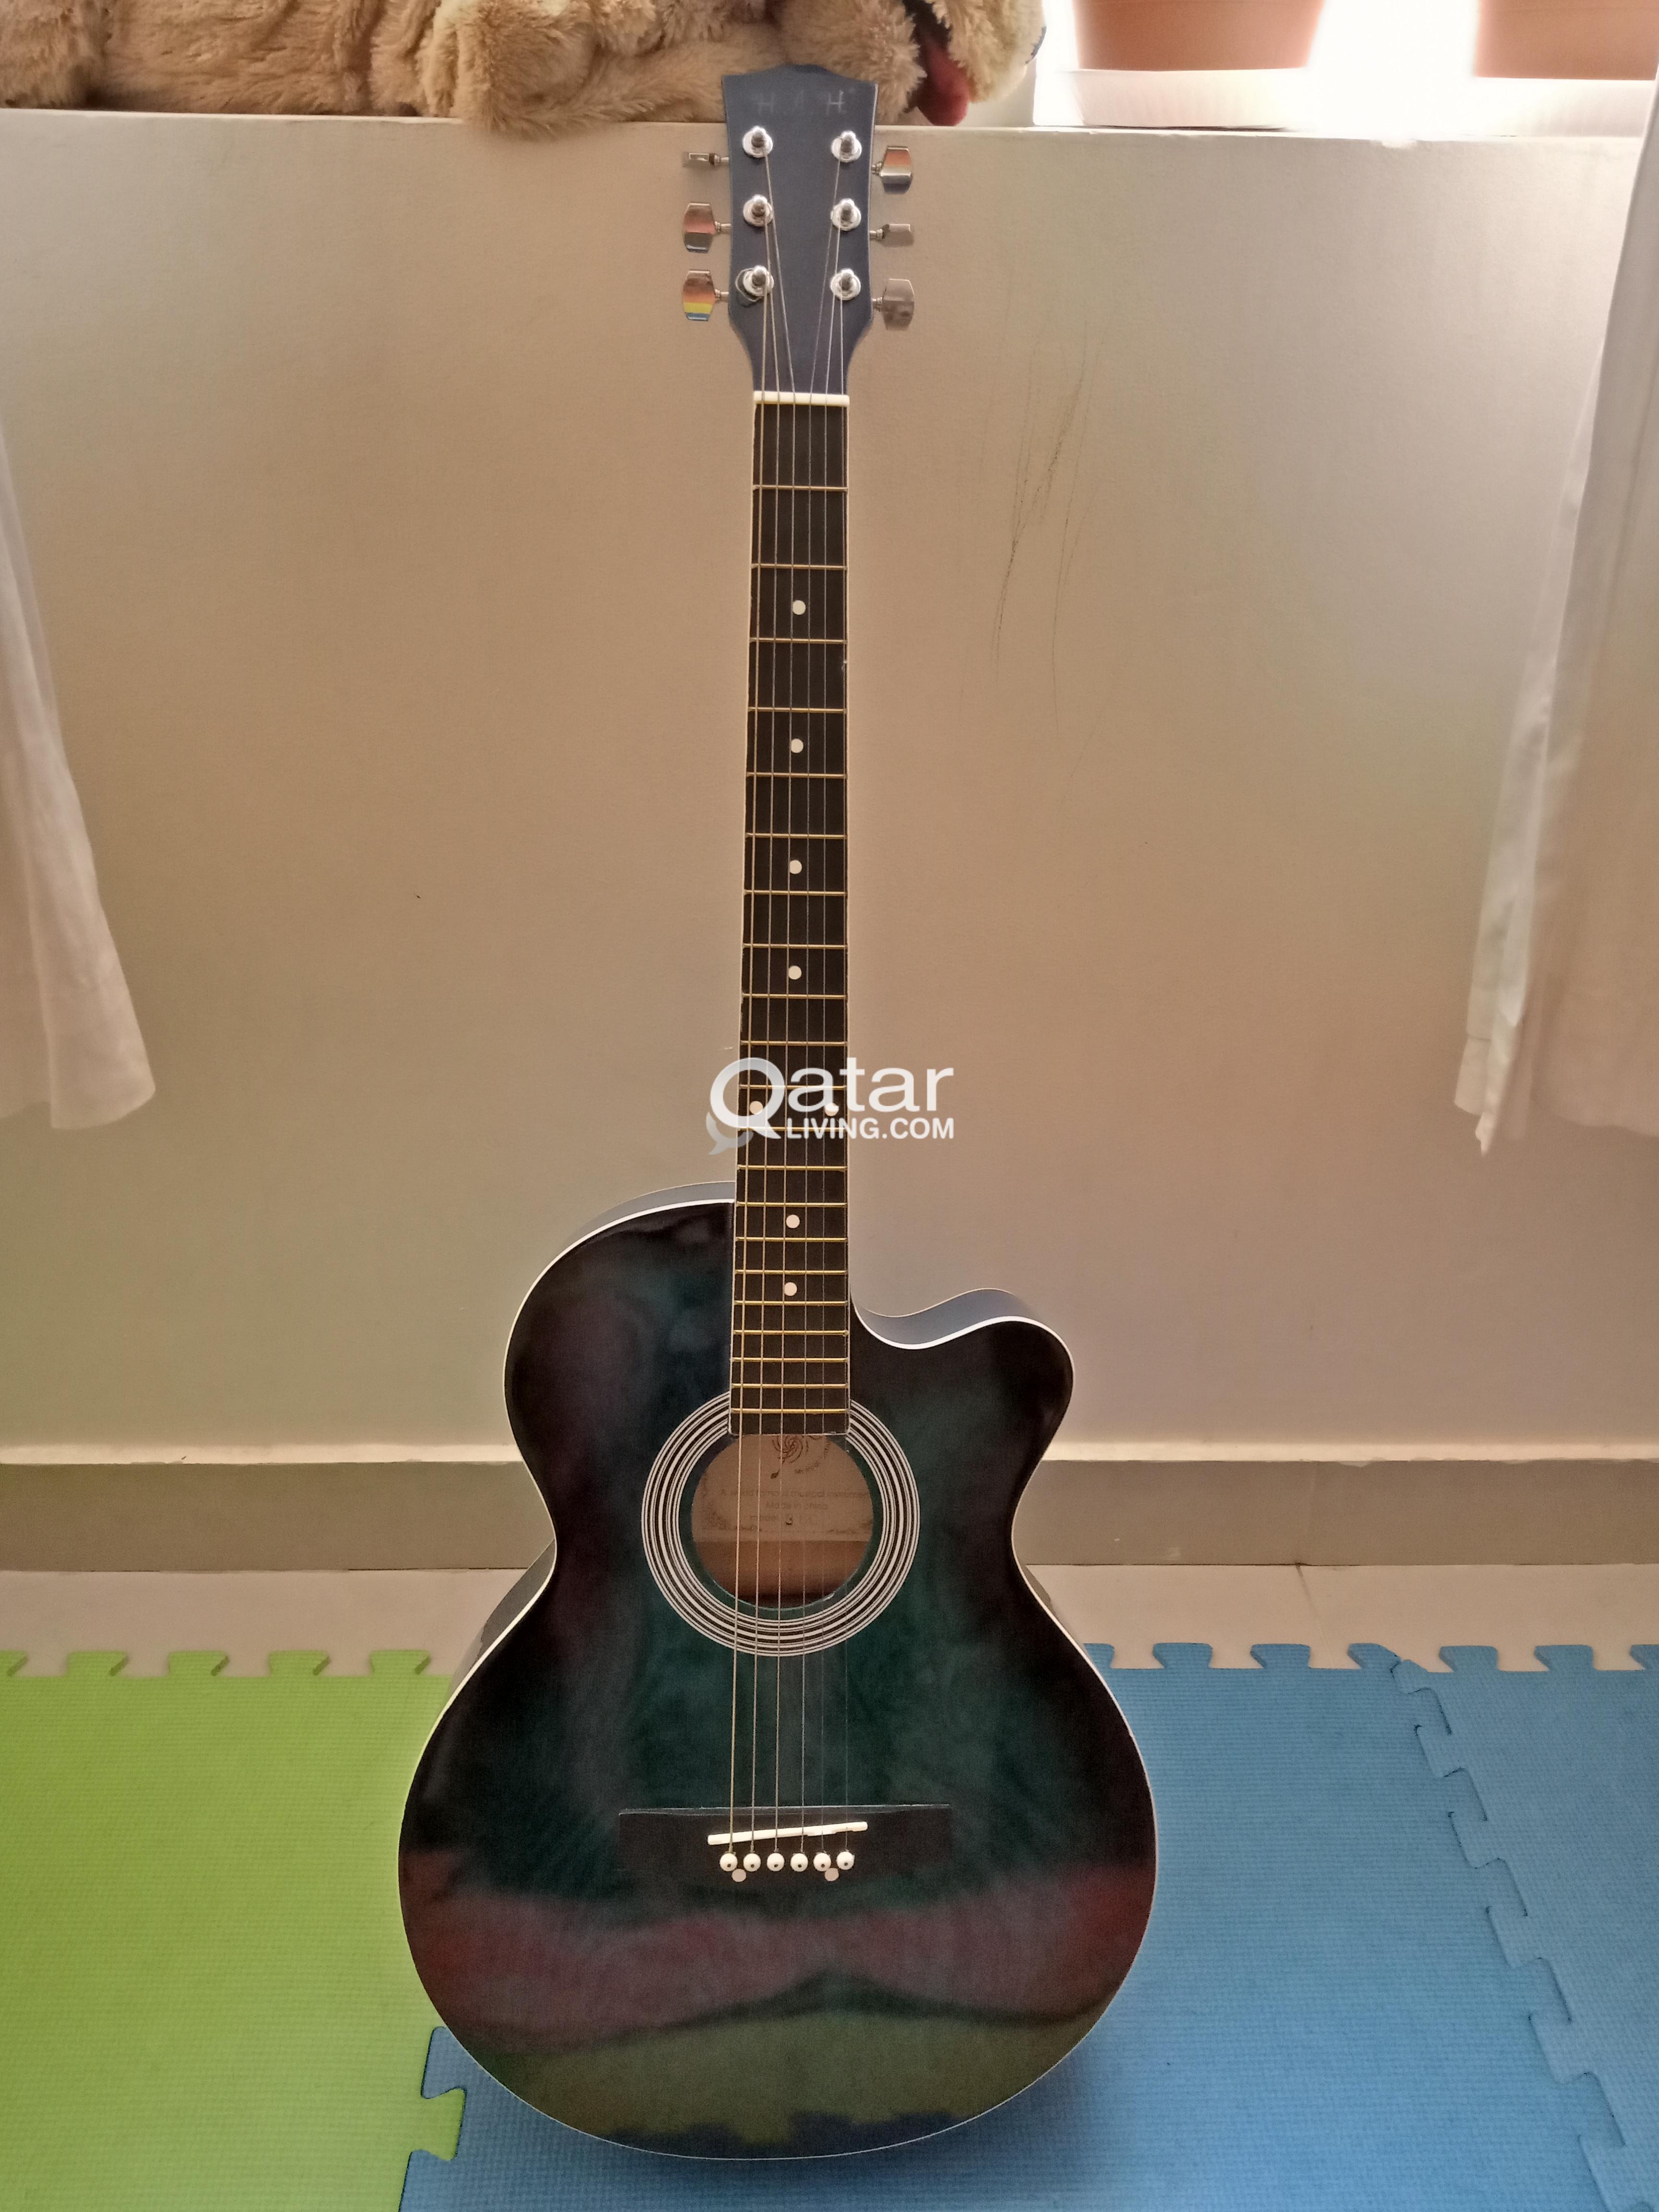 Acoustic Guitar Qatar Living